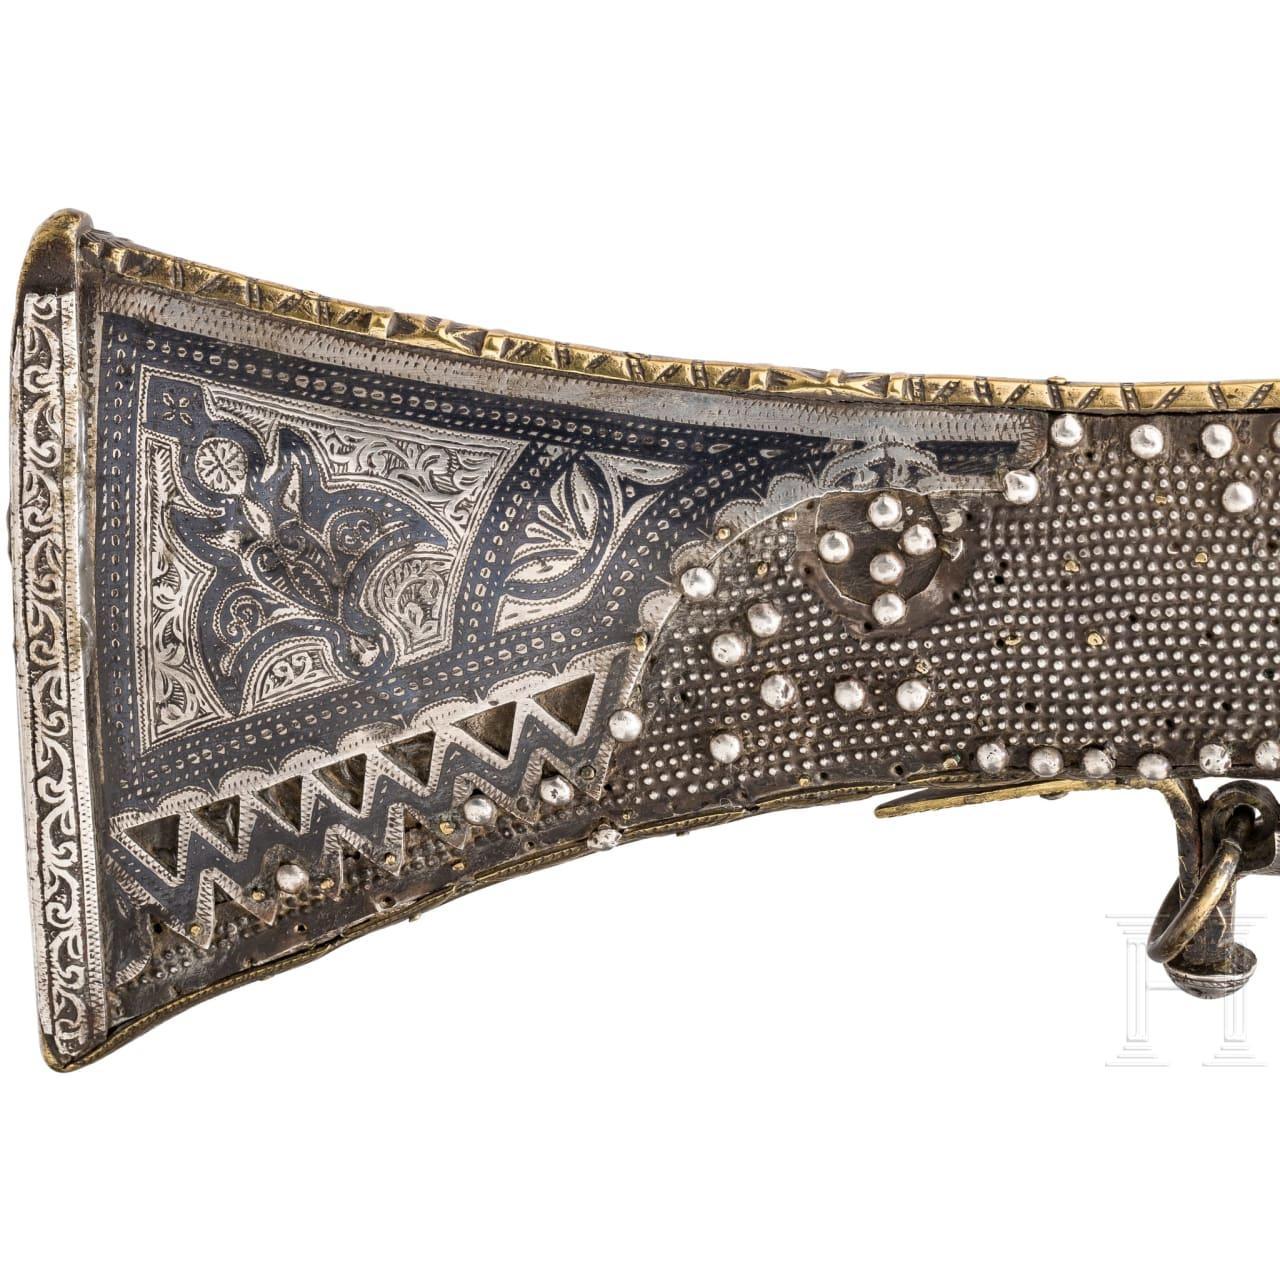 A sumptuous silver-mounted, nielloed Moroccan moukhala, 19th century